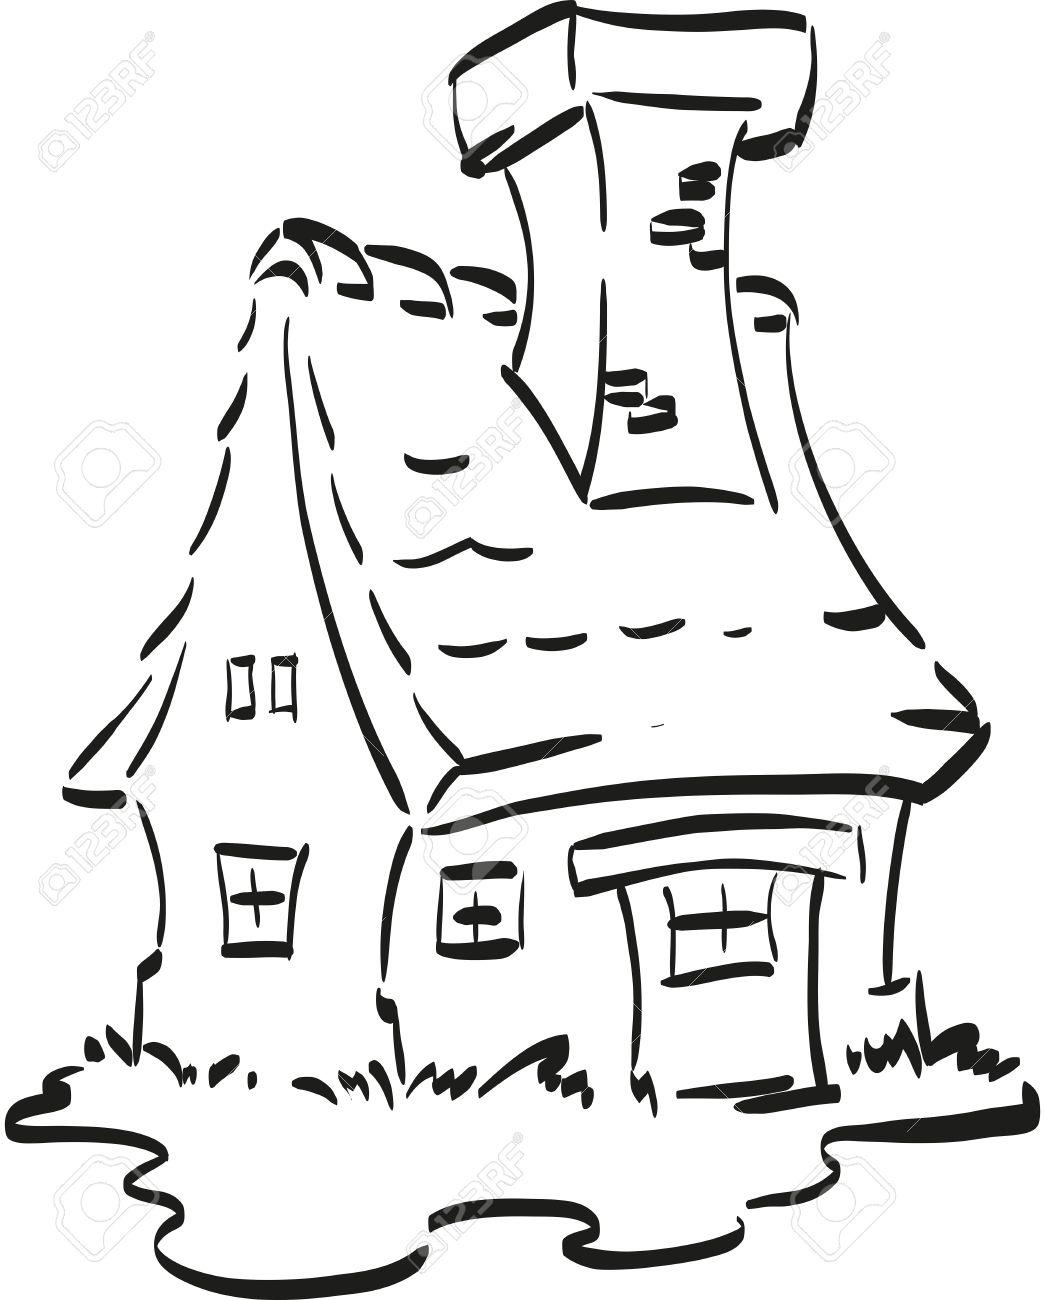 Dibujo Casa Para Colorear. Dibujo De Casa De Dos Pisos Con Torre ...